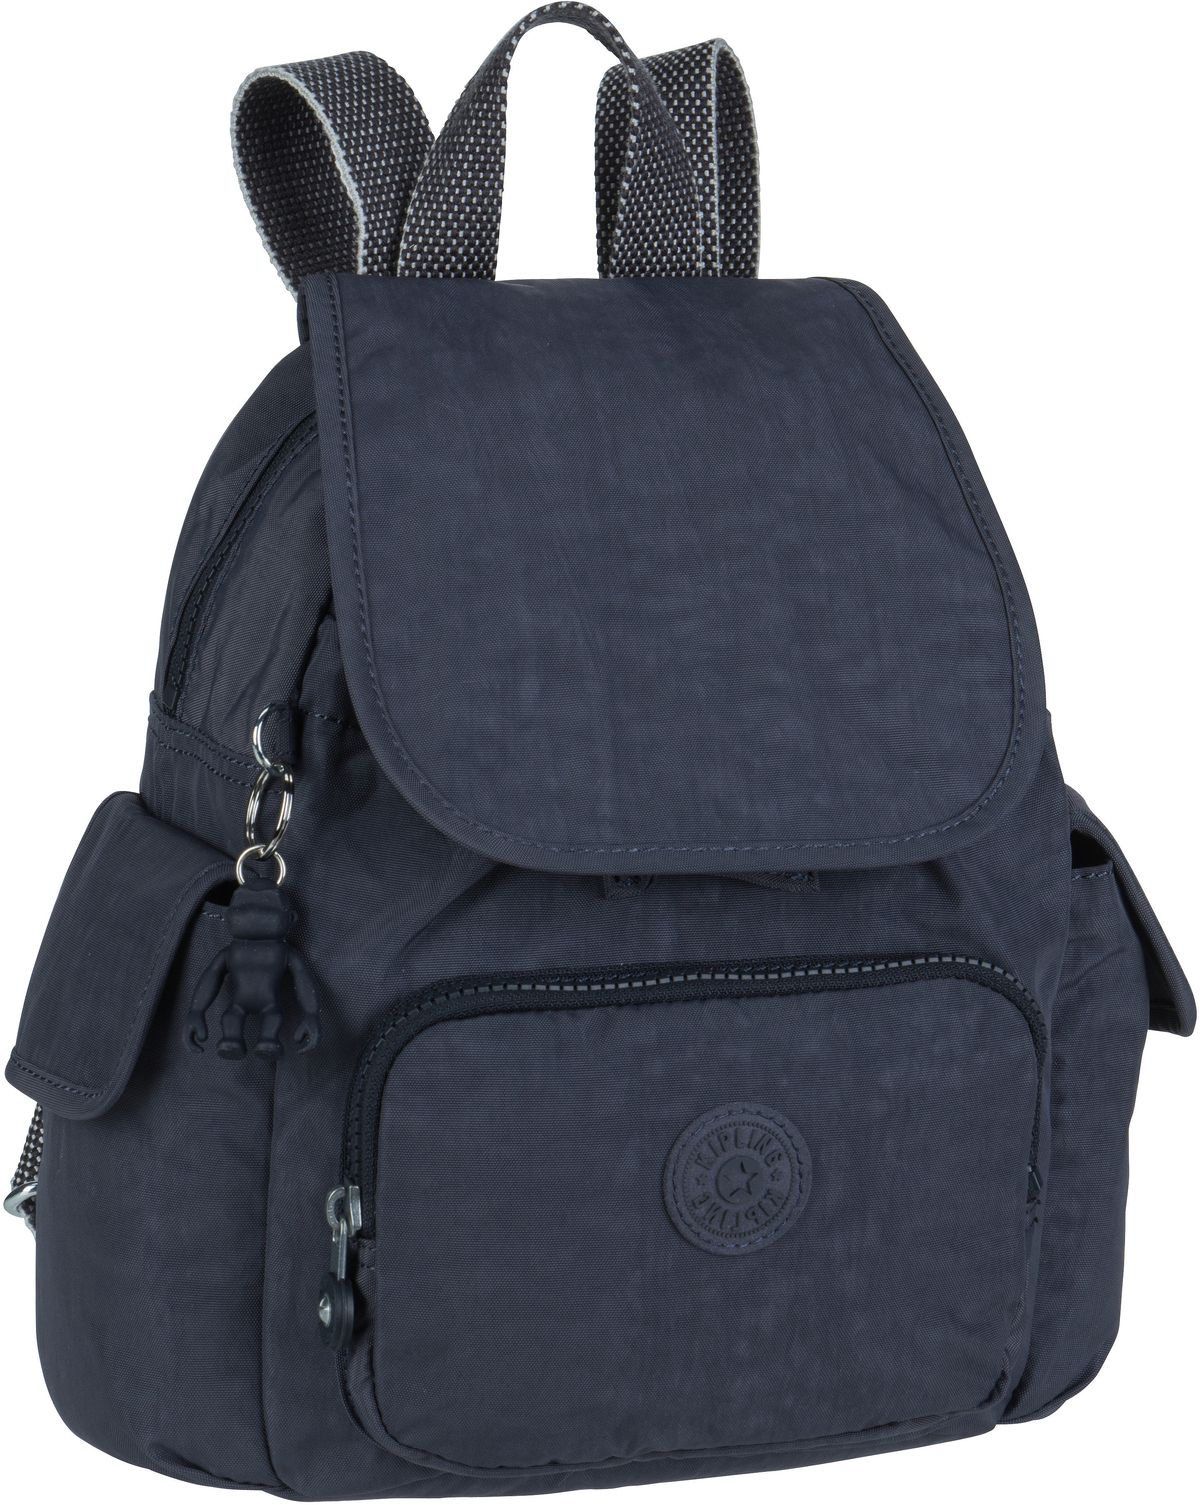 Rucksack / Daypack City Pack Mini Basic Plus Night Grey (13 Liter)